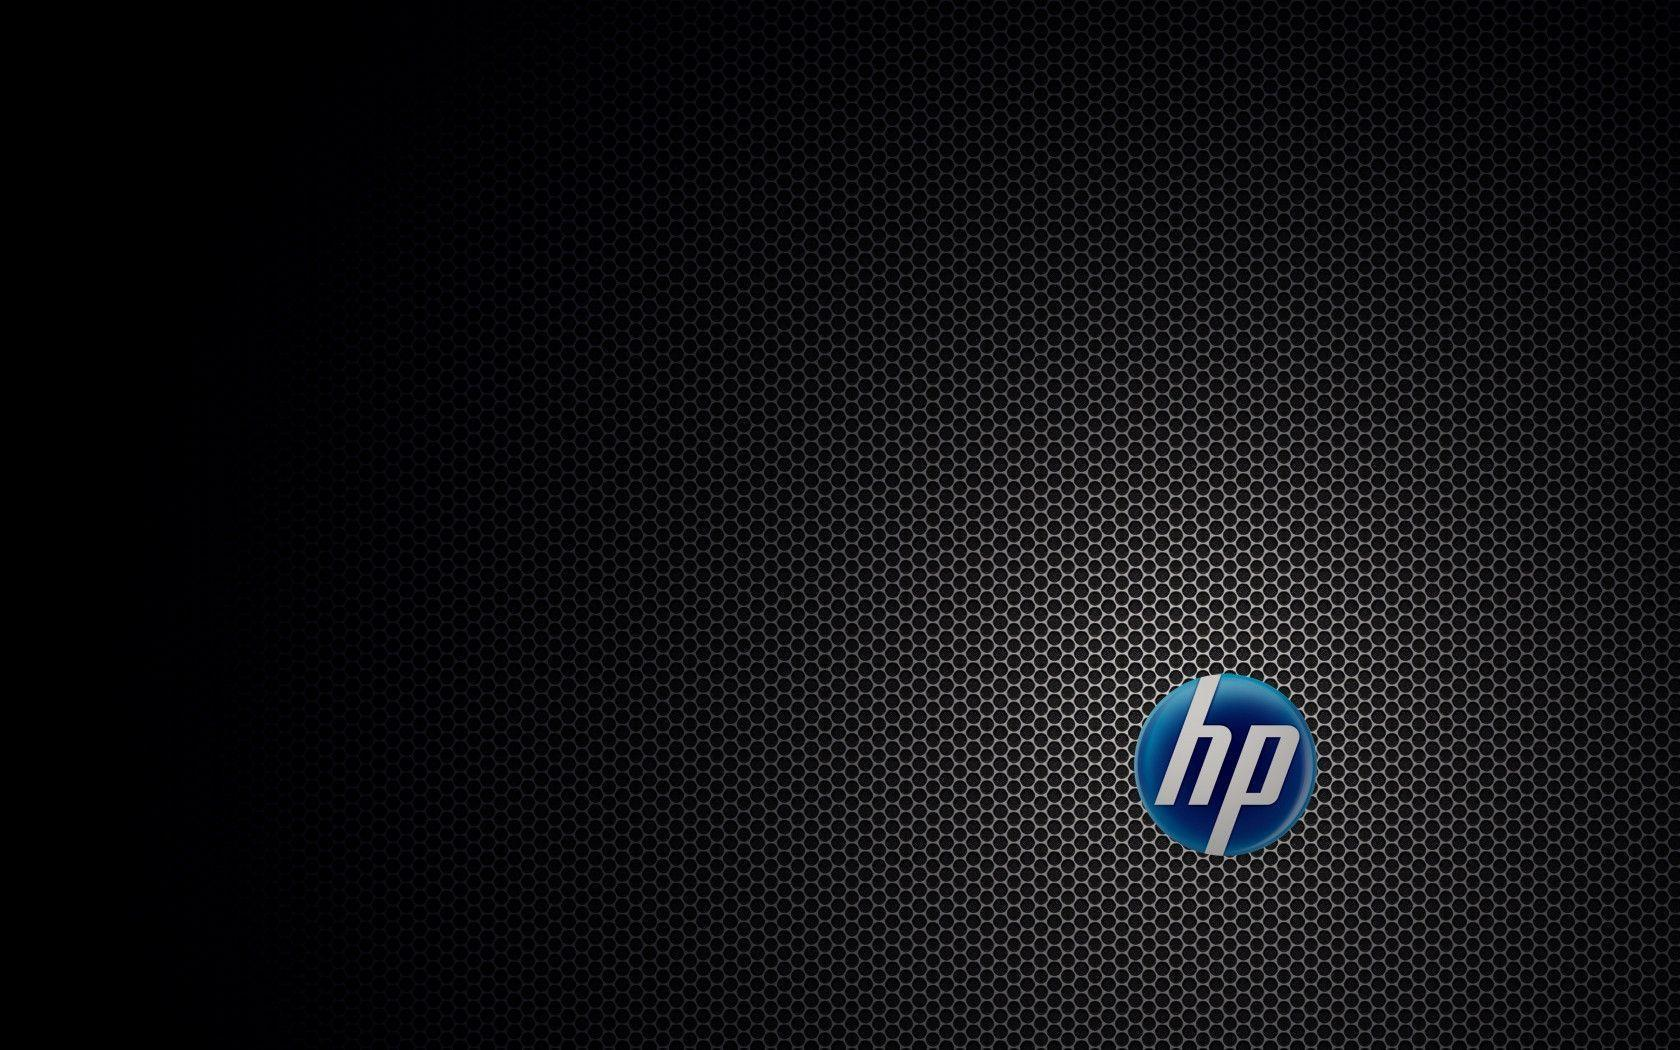 HP Backgrounds Wallpaper HD Wallpapers | Genovic.